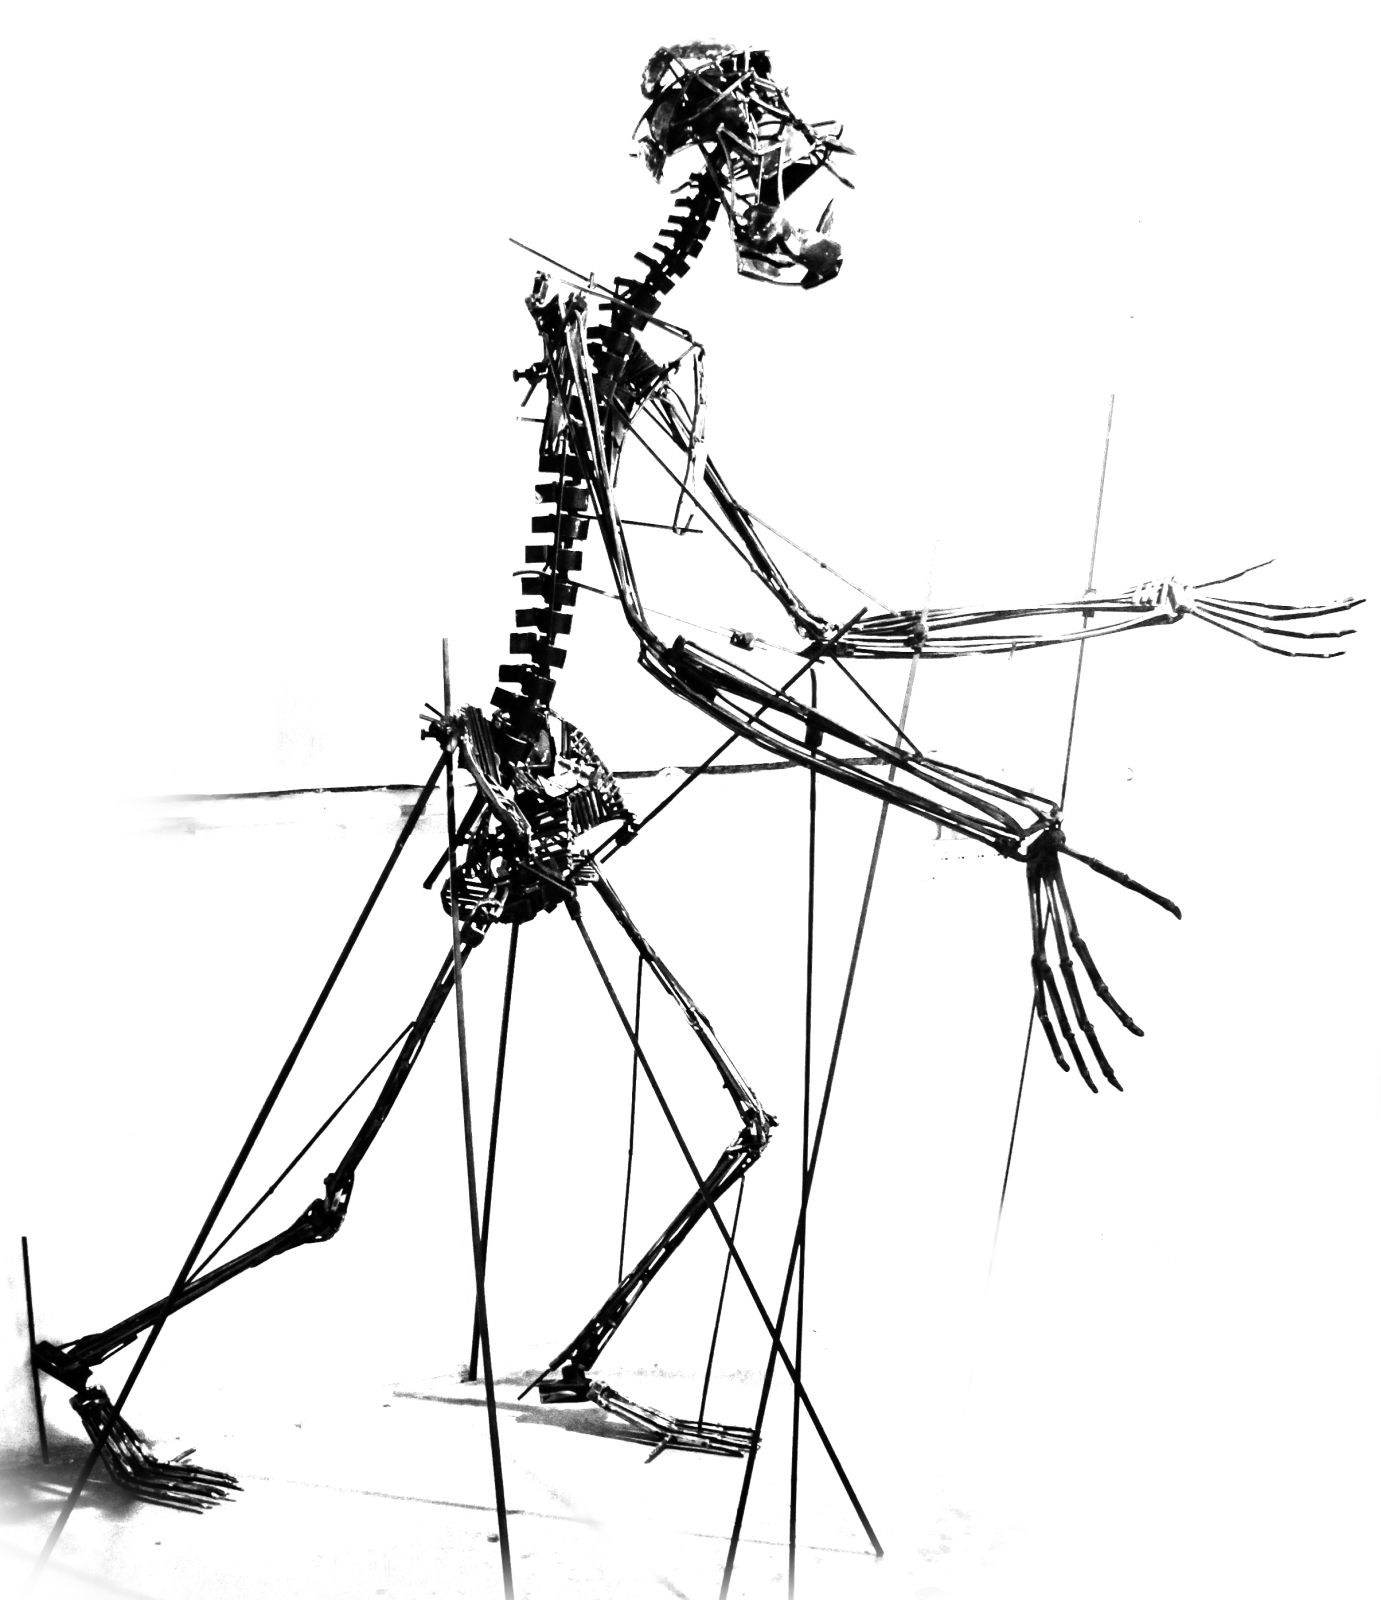 sideropithecus-b